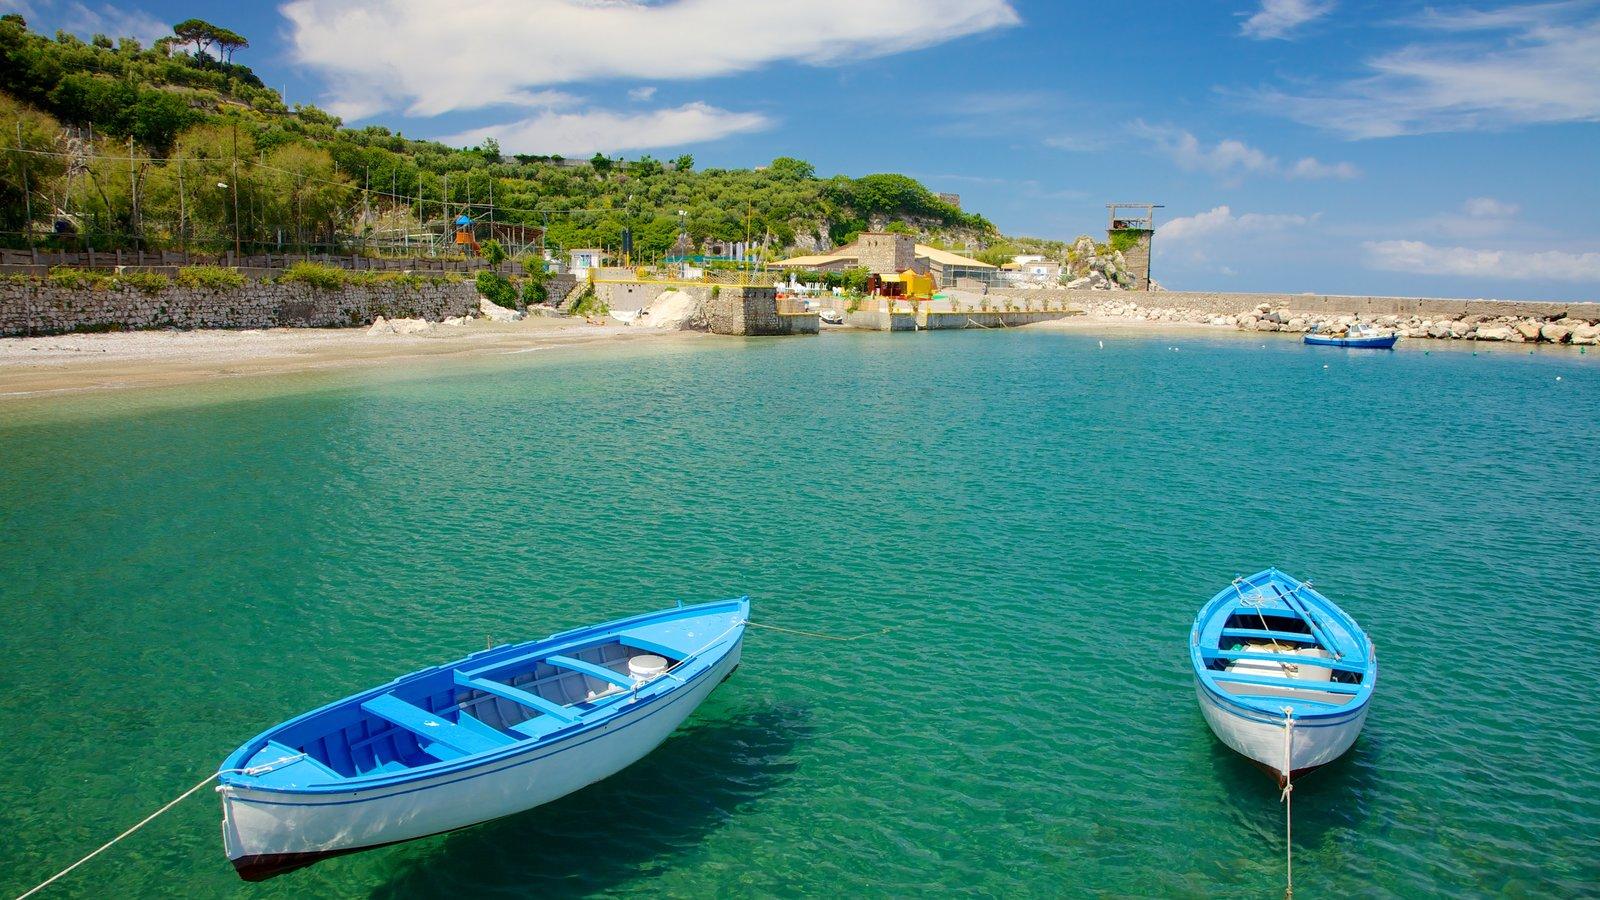 Sorrento showing general coastal views and boating